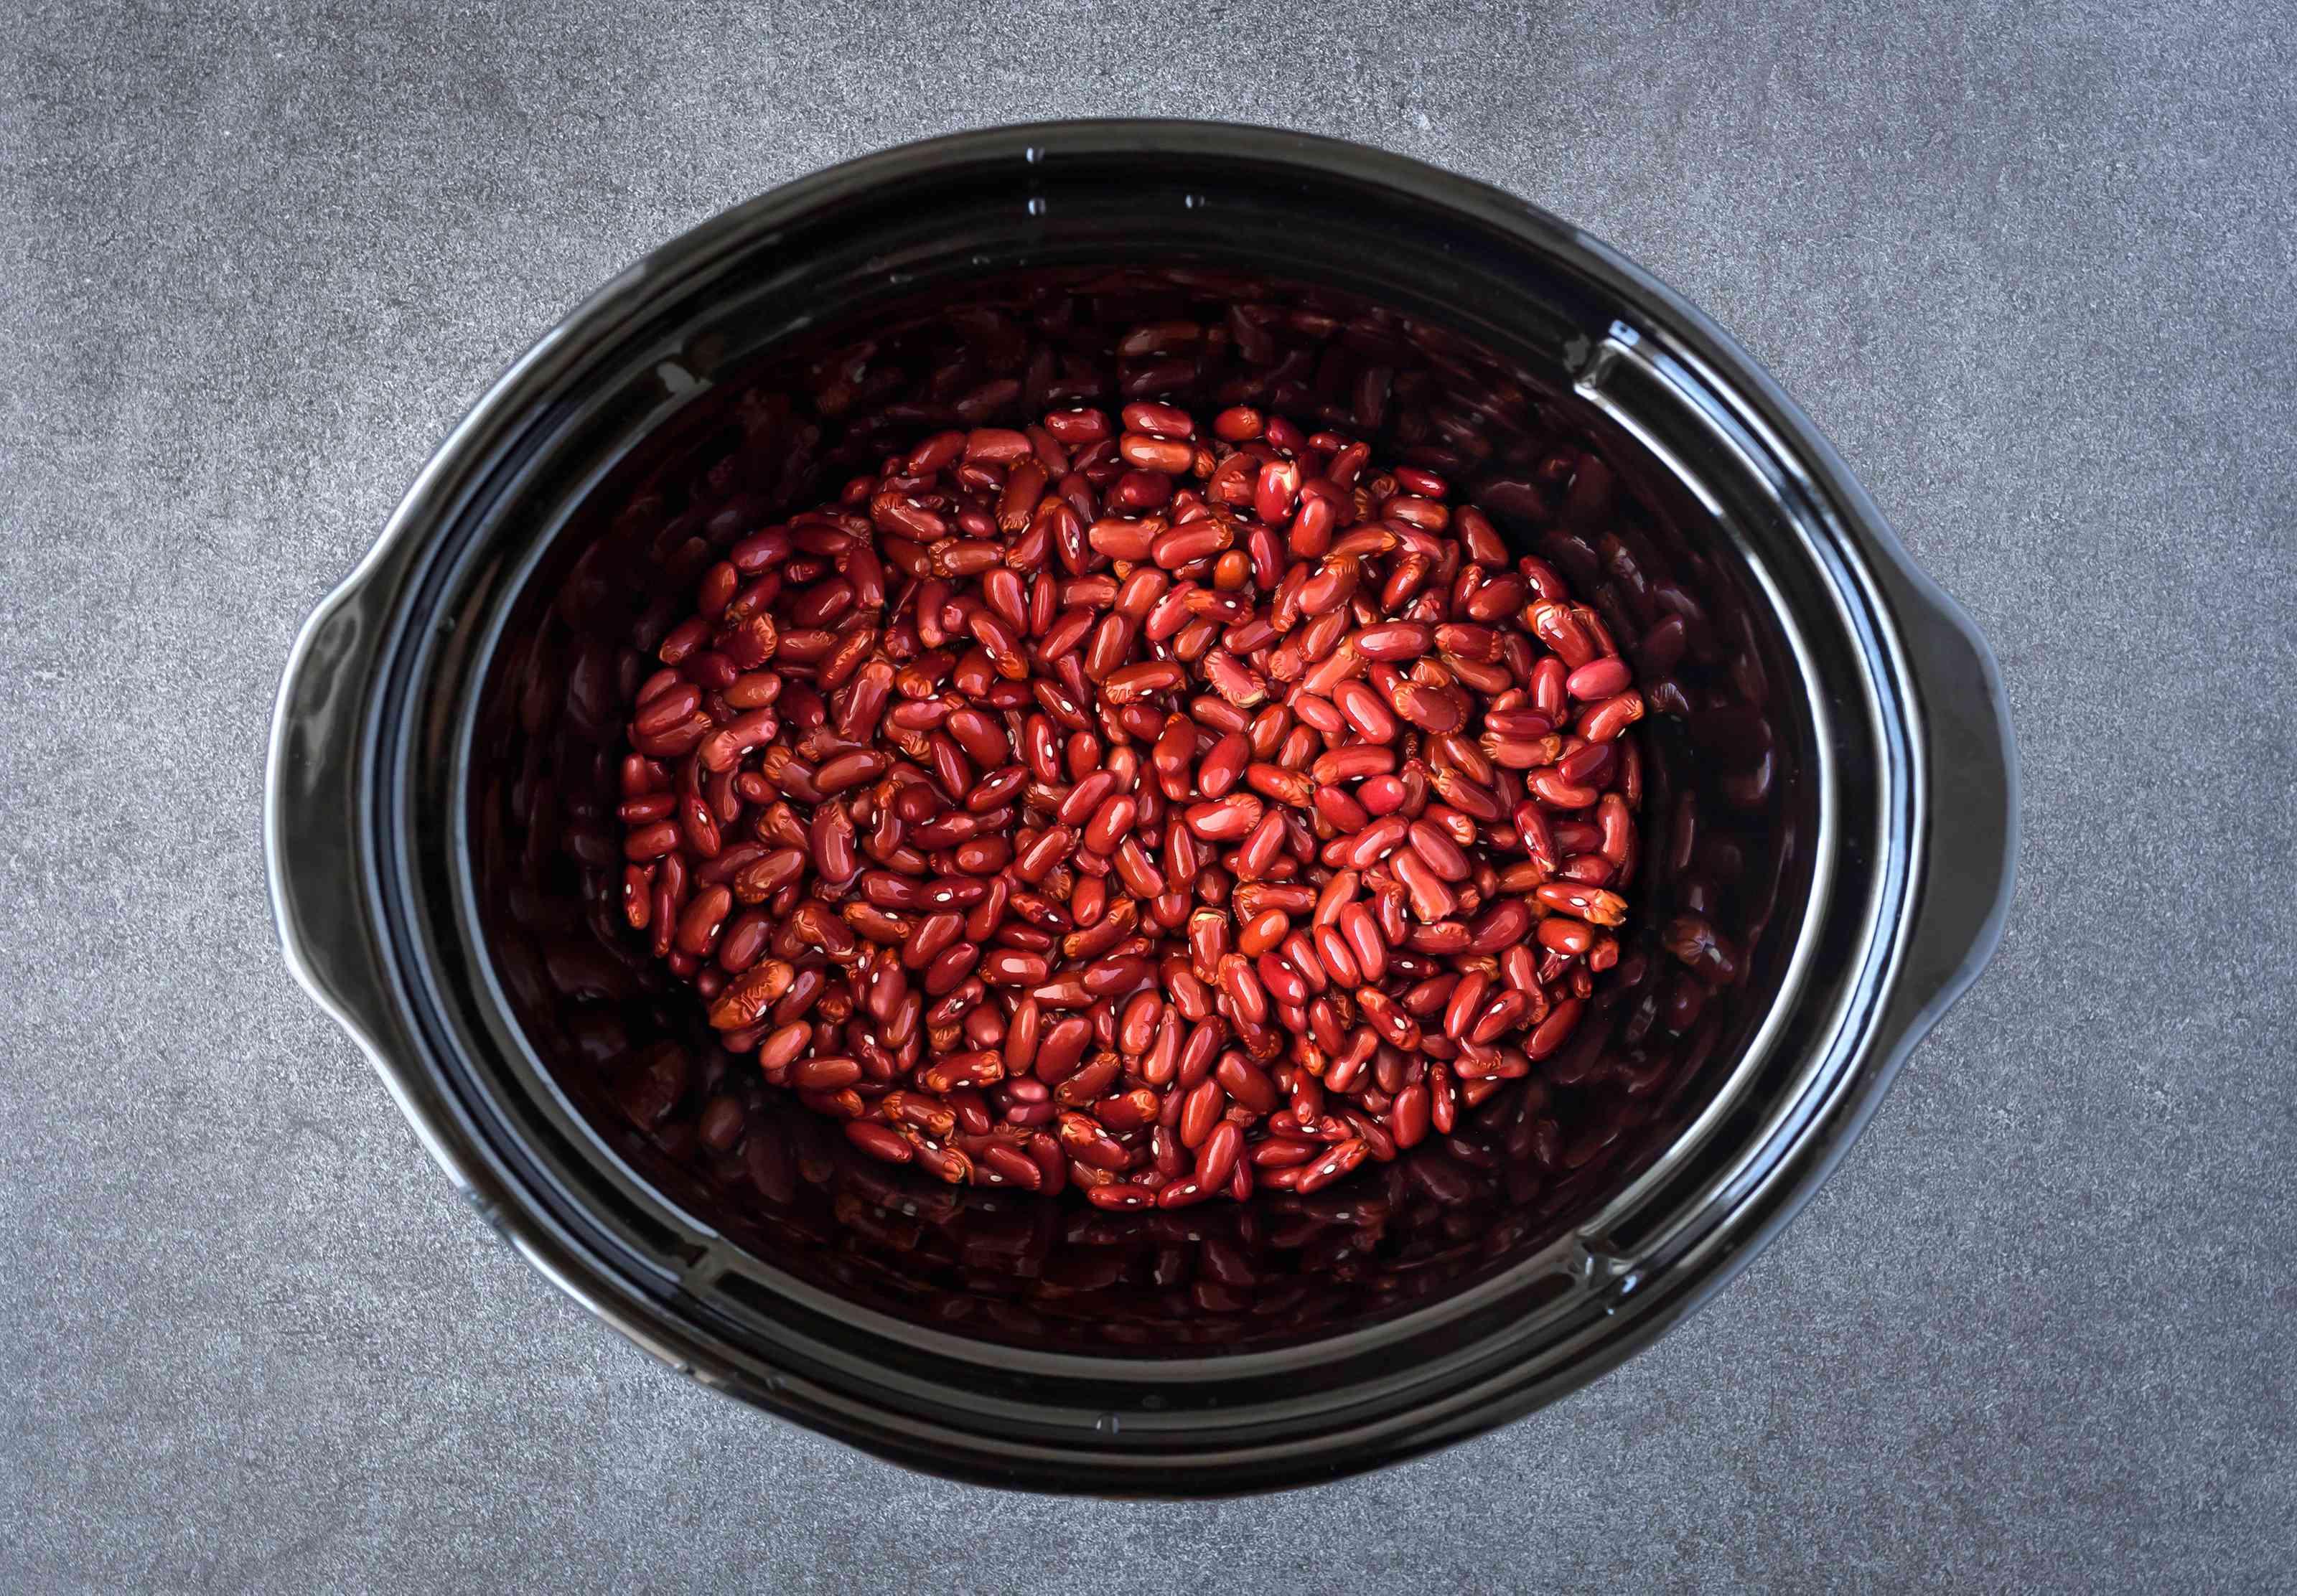 Put beans in crockpot